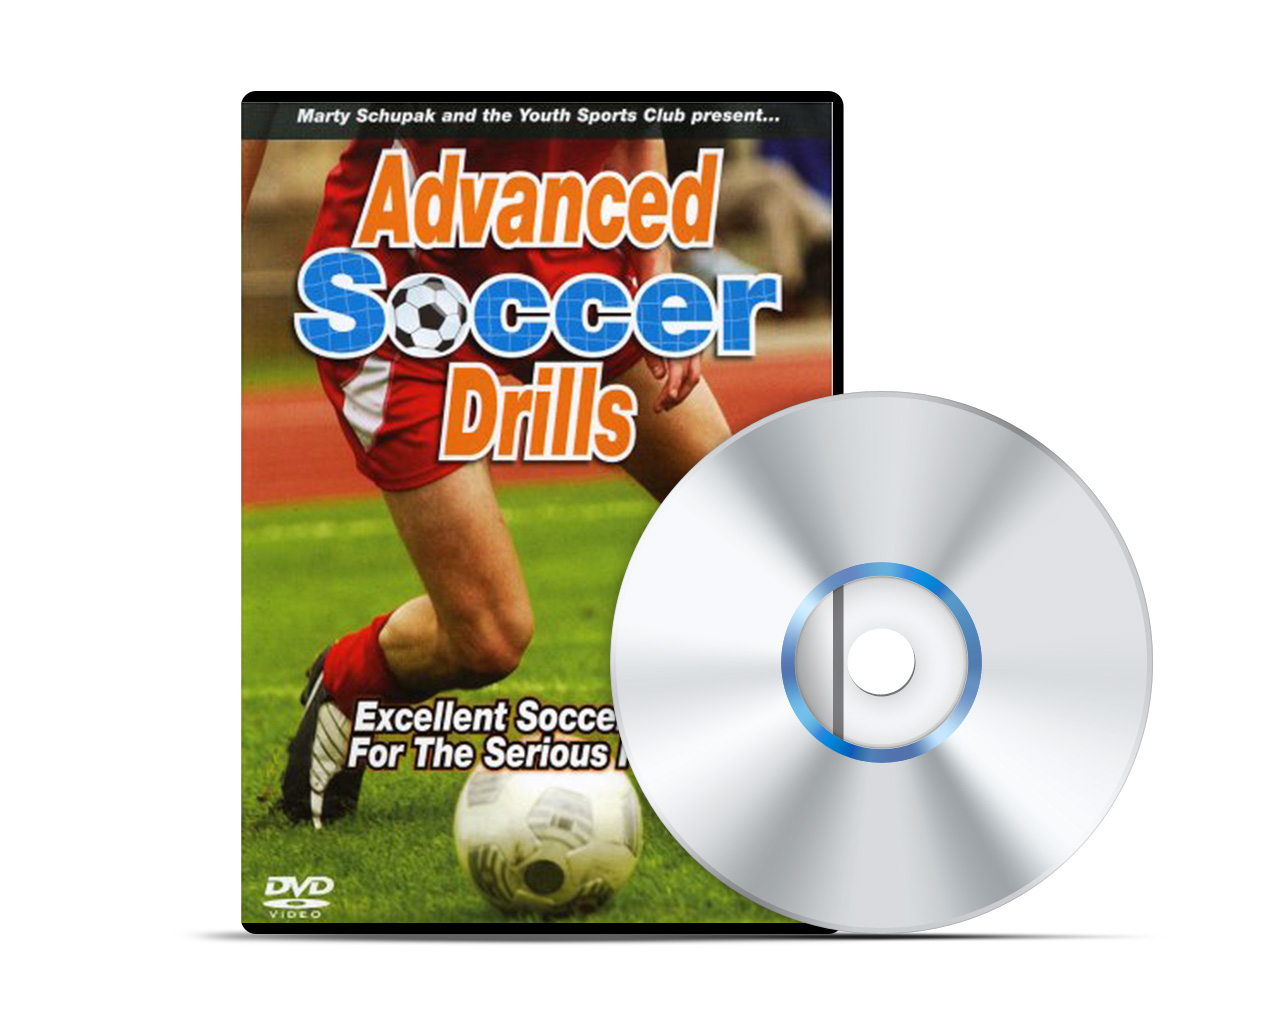 advanced soccer drills dvd.jpg